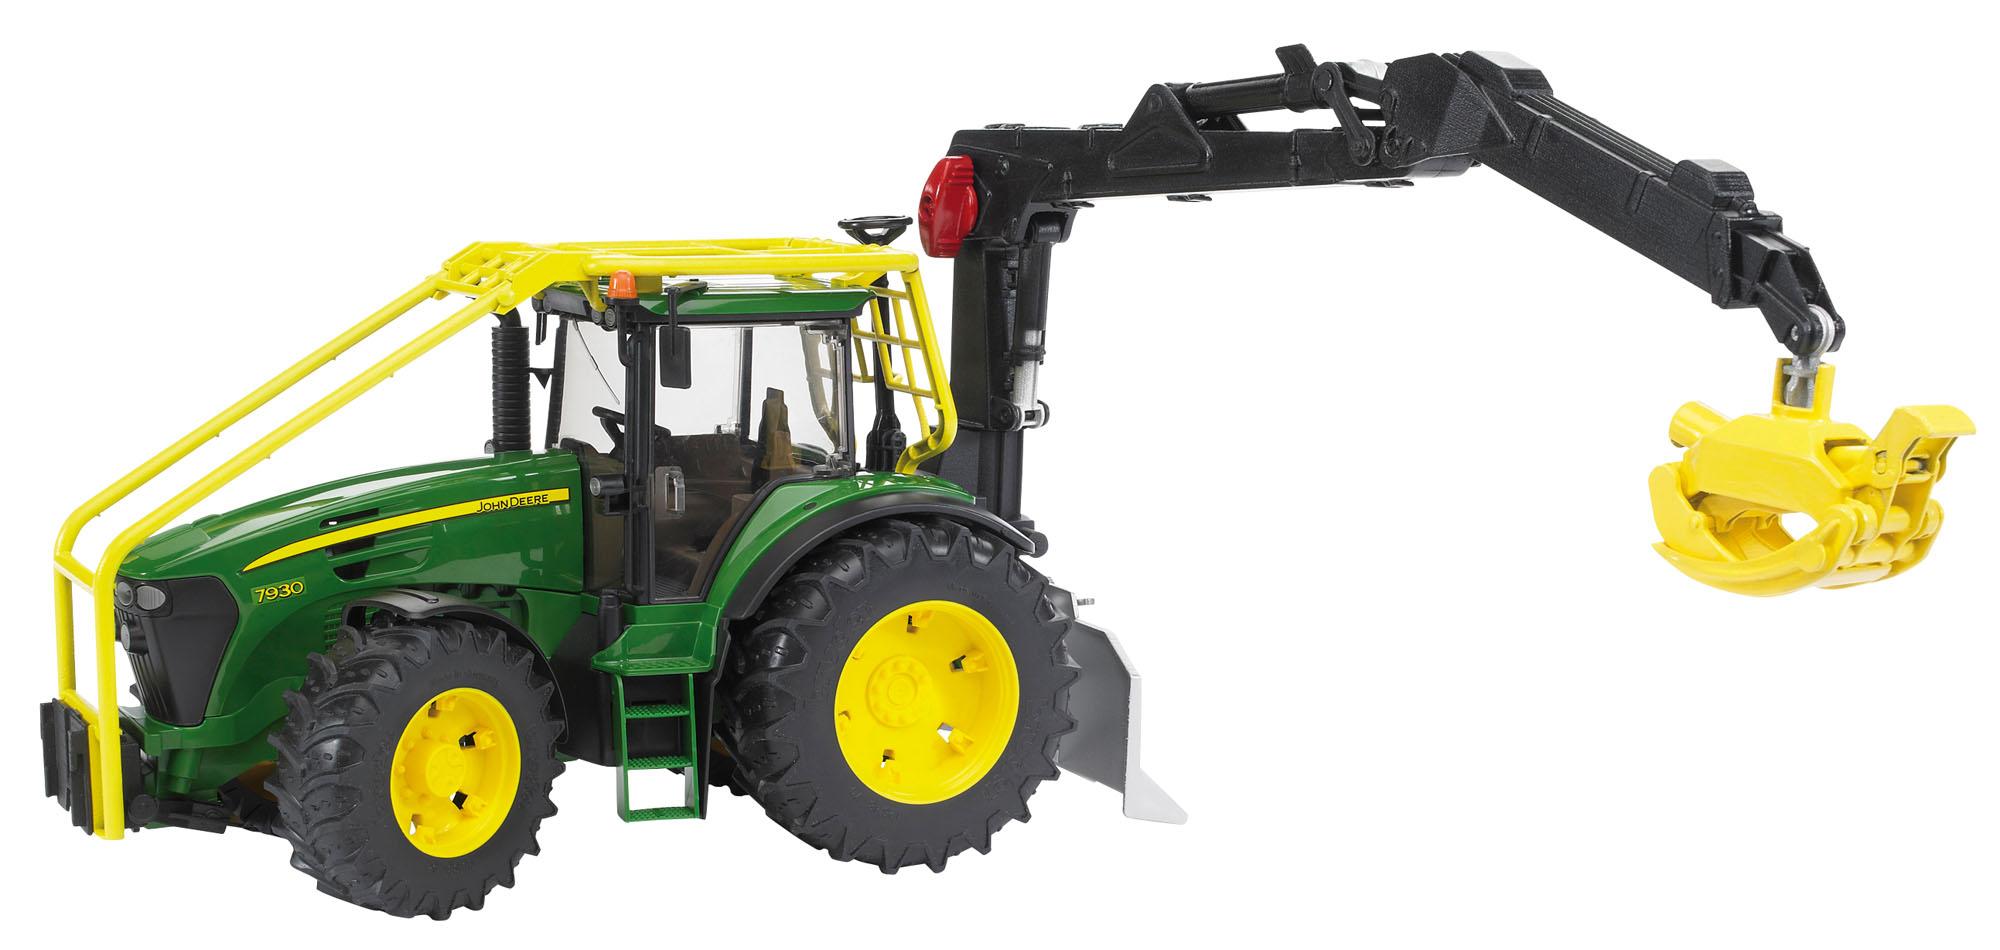 Nouveau coloriage tracteur forestier de lego - Dessin anime de tracteur john deere ...